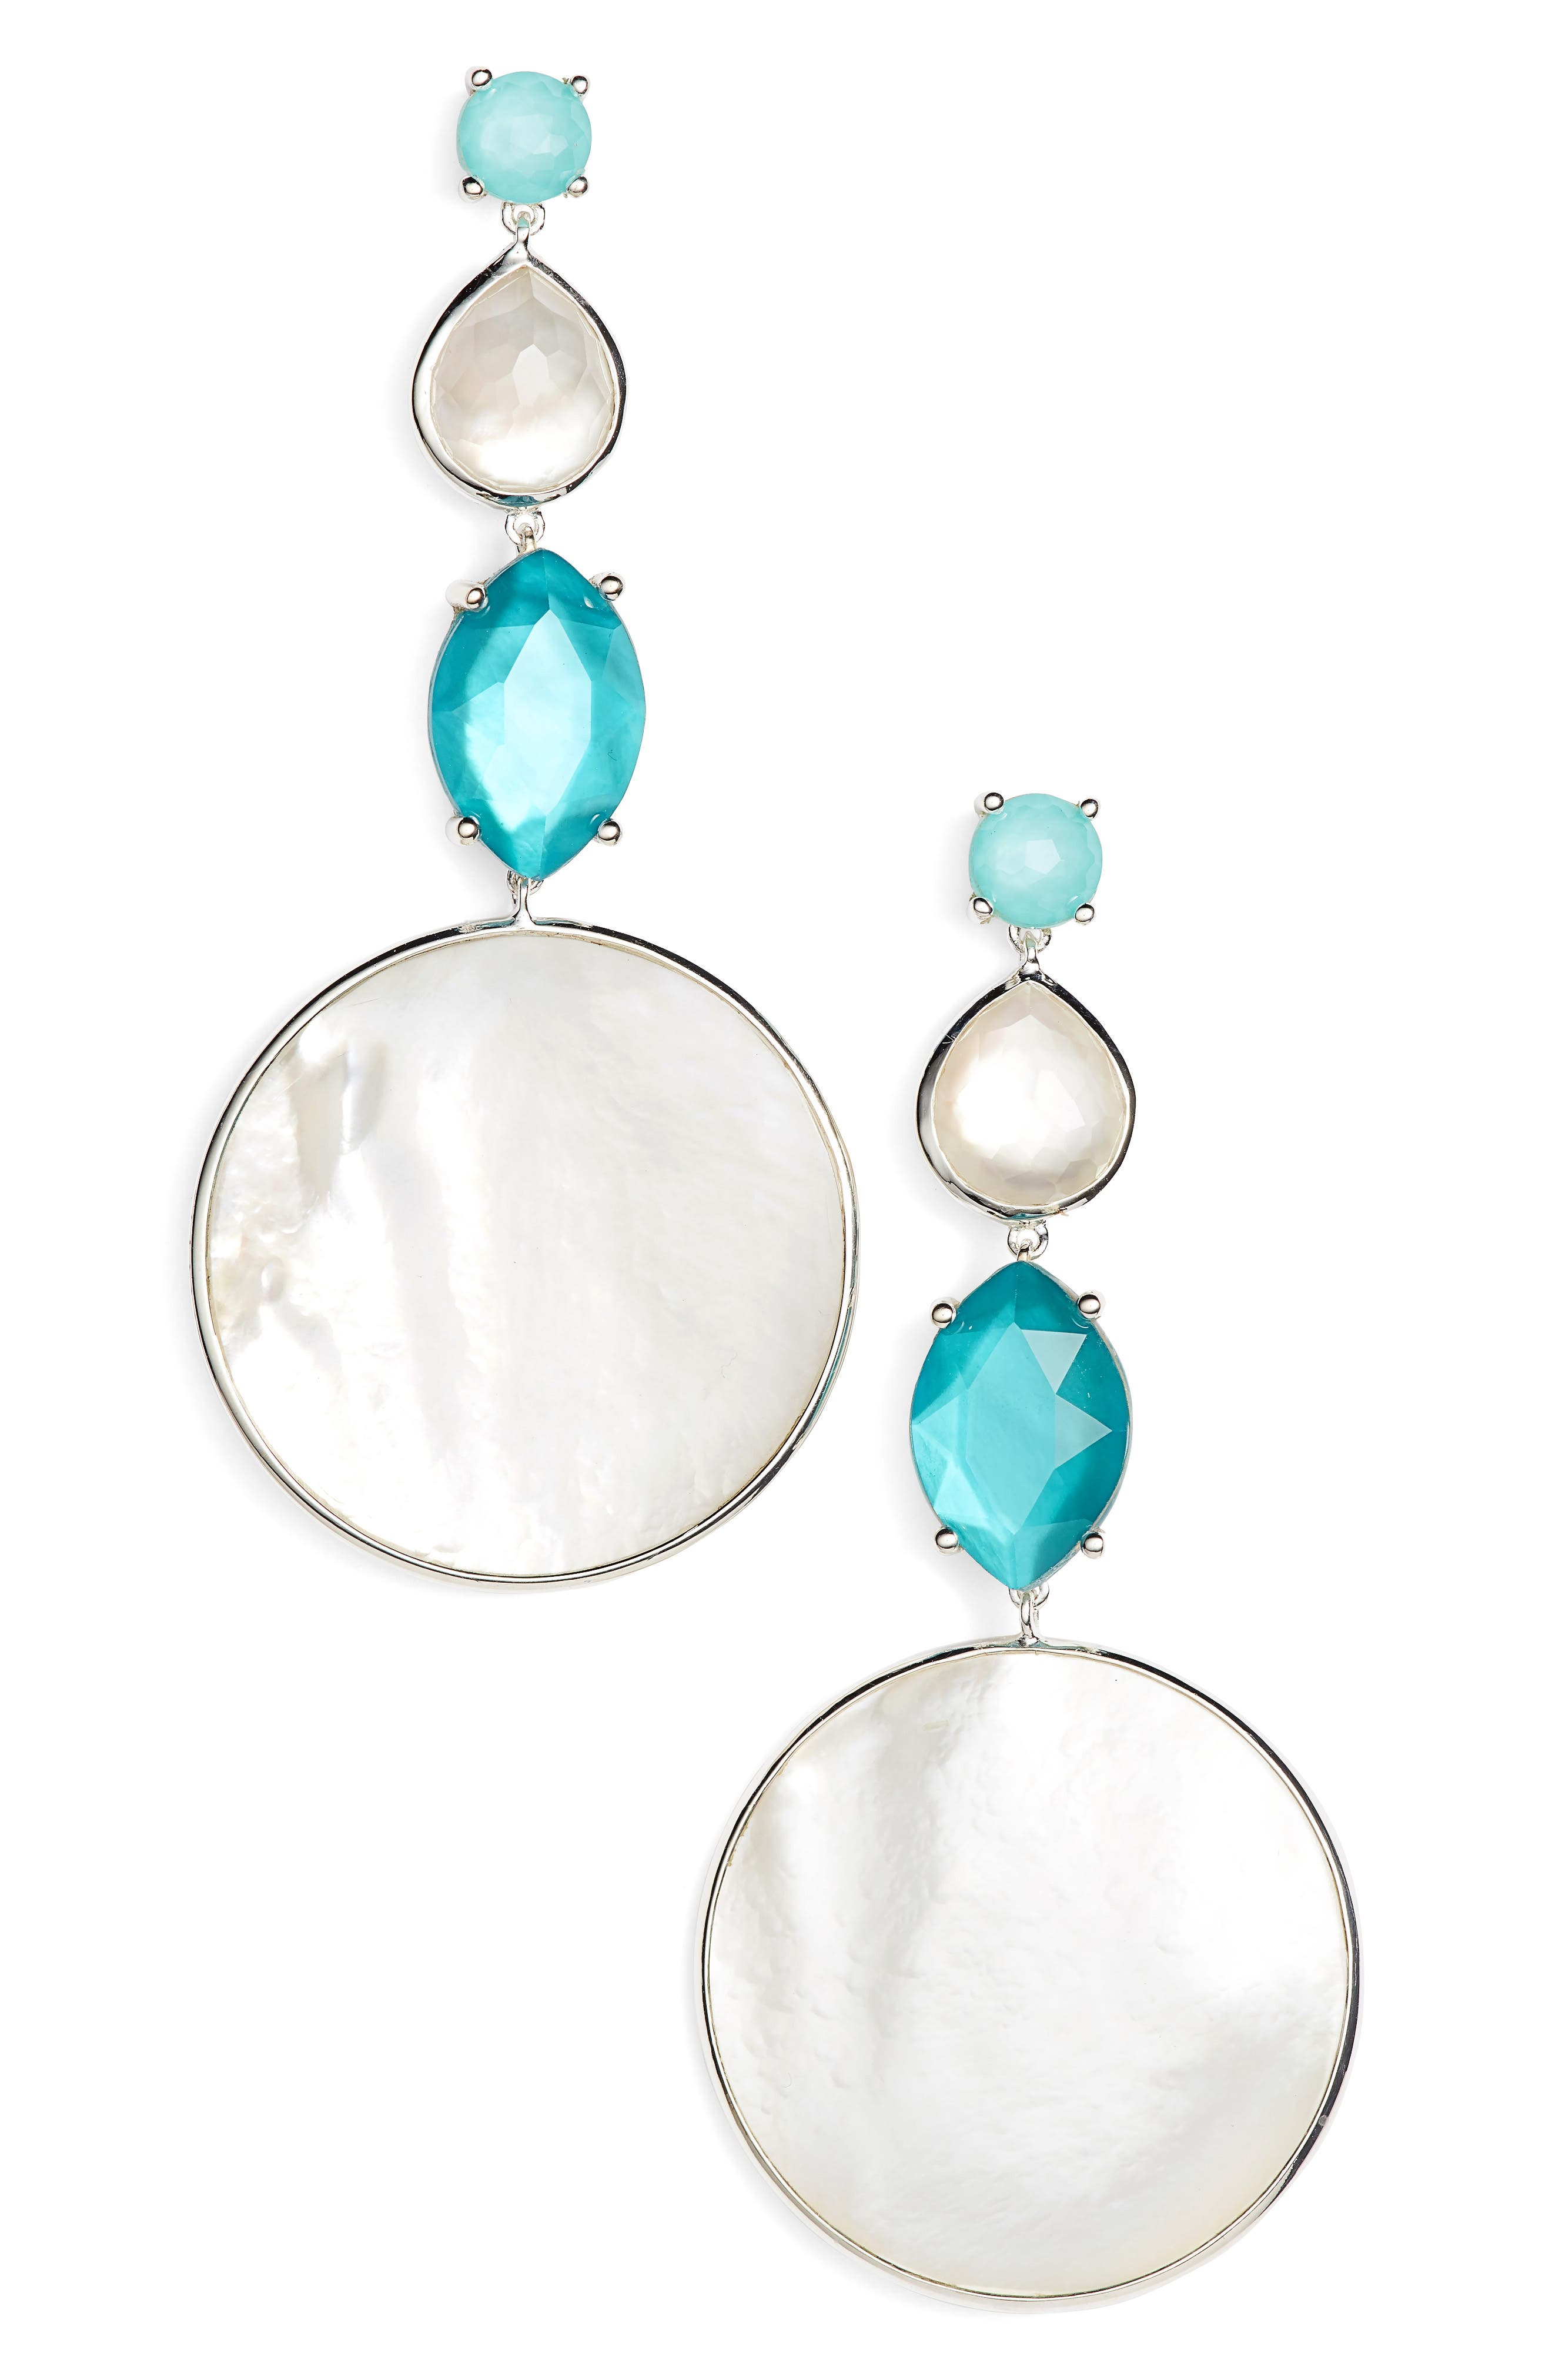 Multi Shape Stone Drop Earrings,                             Main thumbnail 1, color,                             BLUE/ MOP